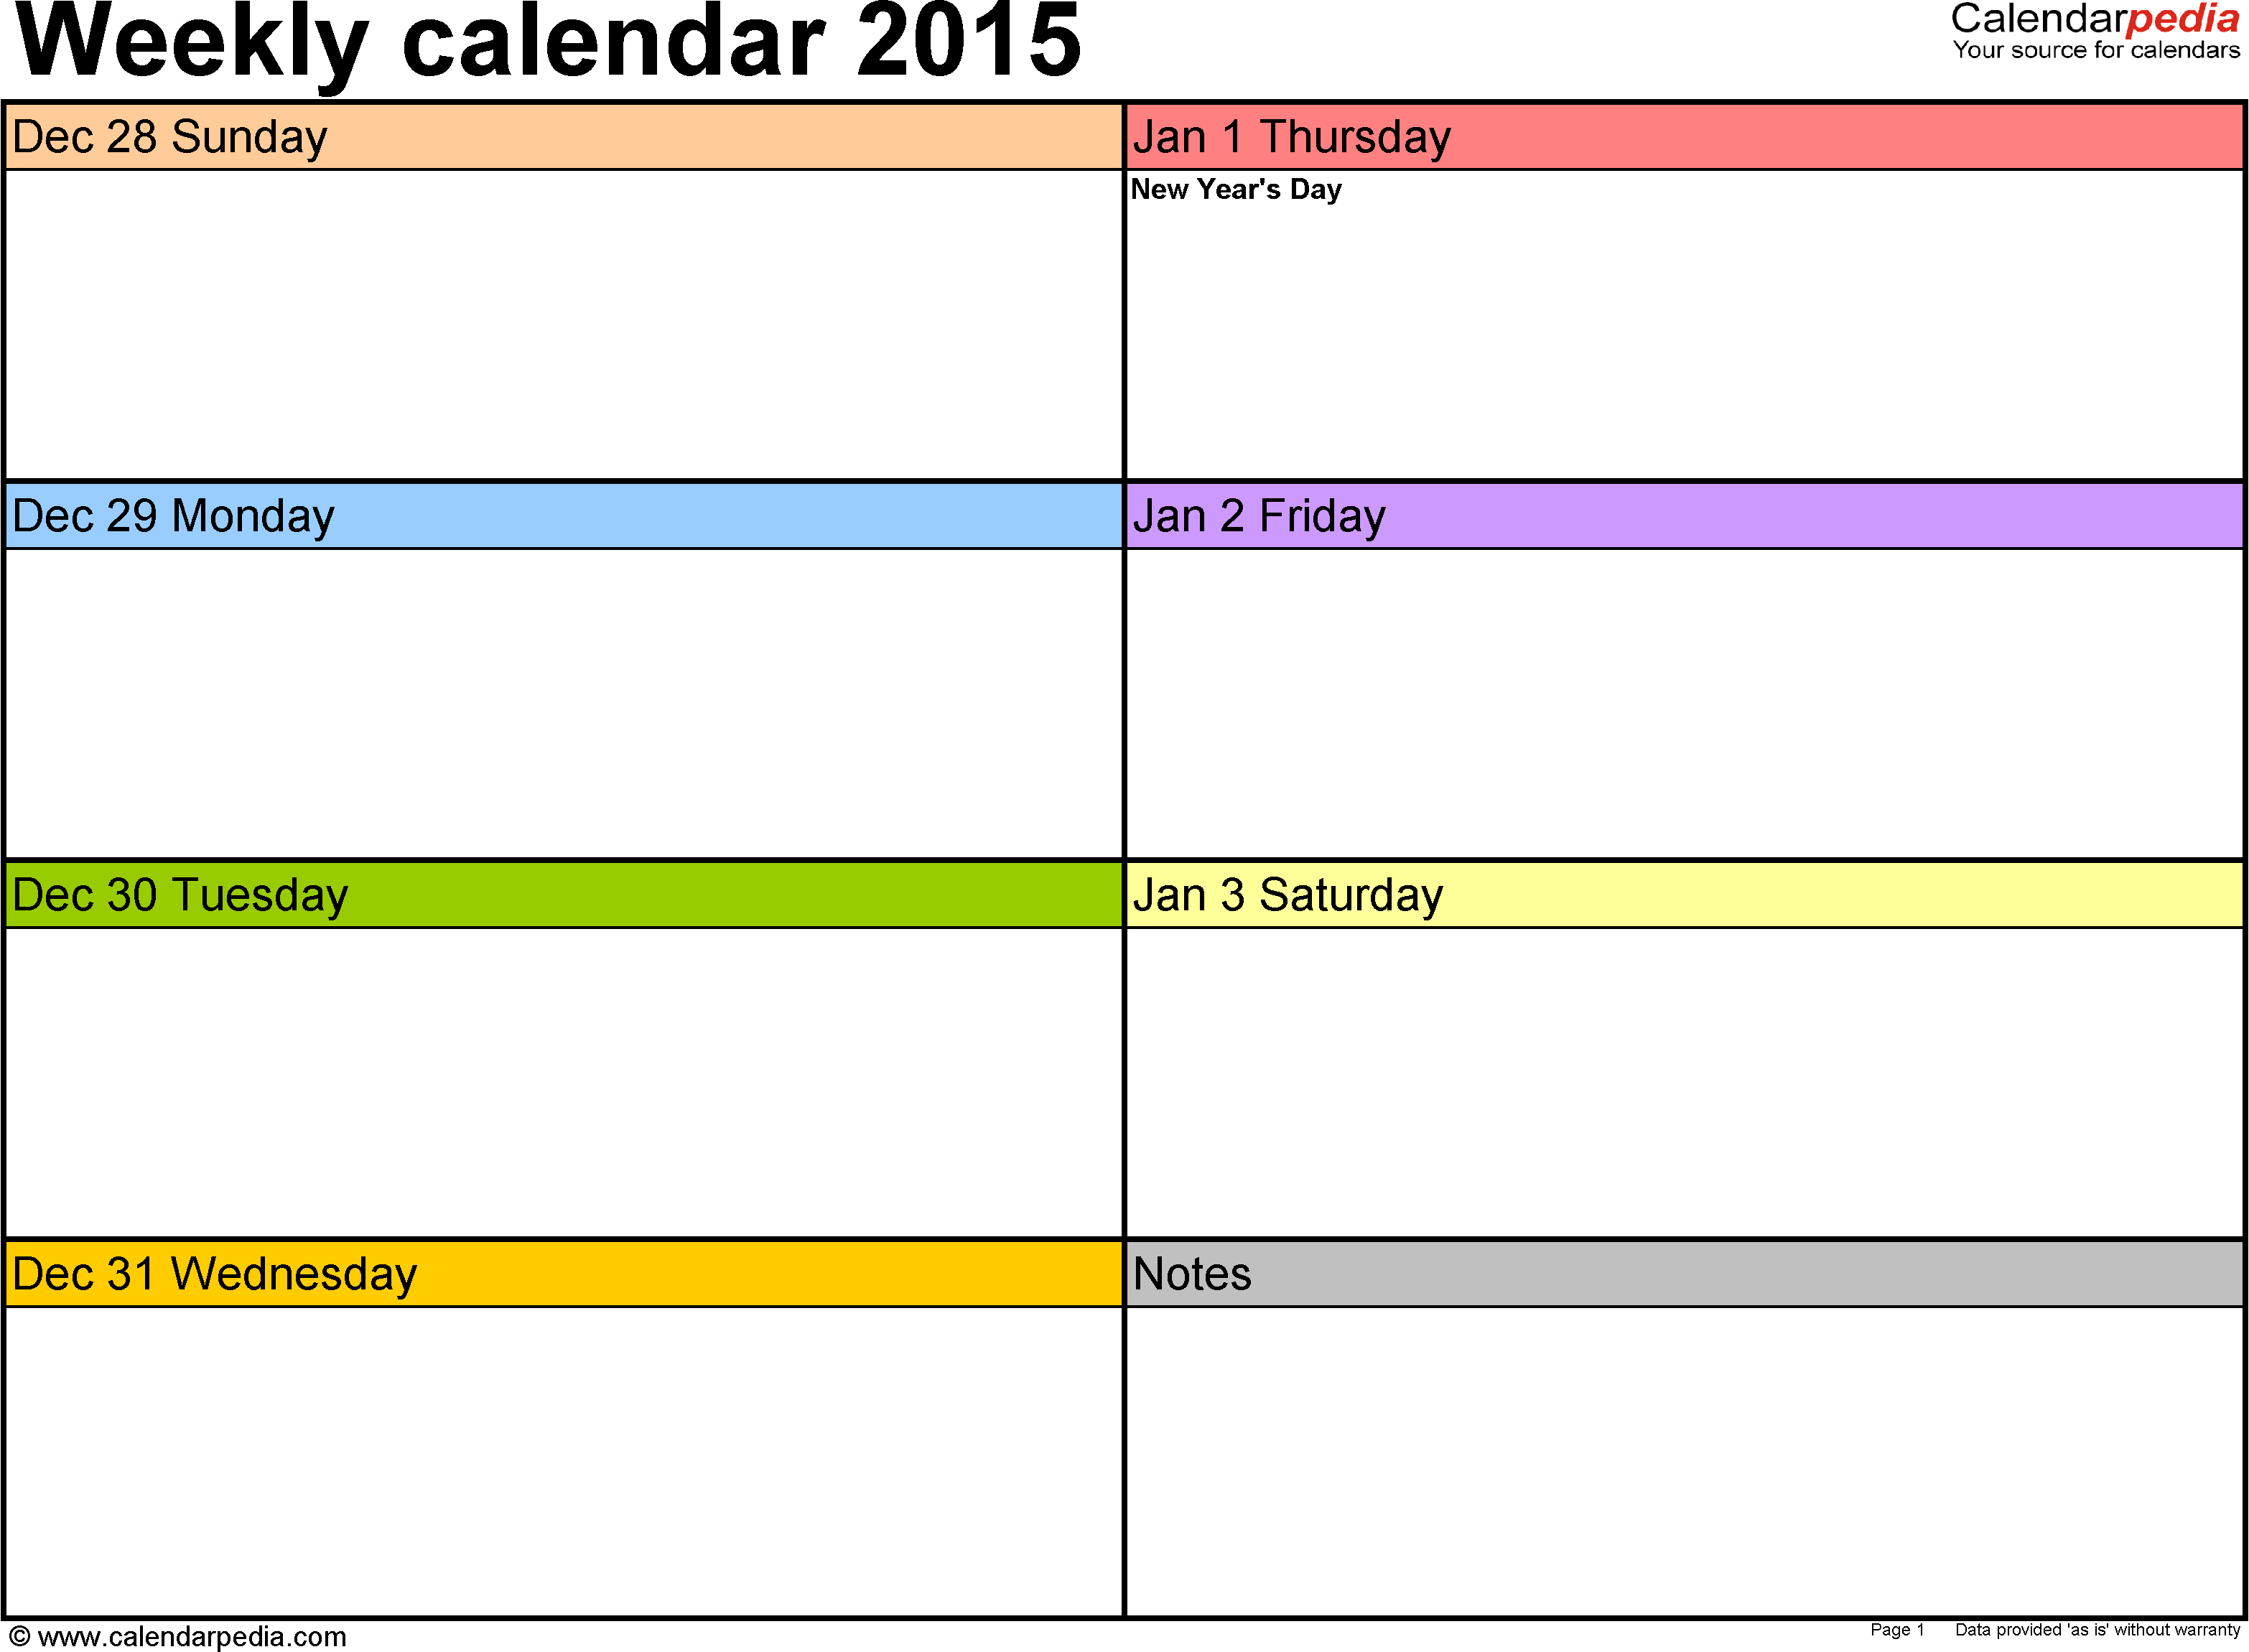 Weekly Calendar 2015 For Pdf - 12 Free Printable Templates - Free Printable Diary 2015